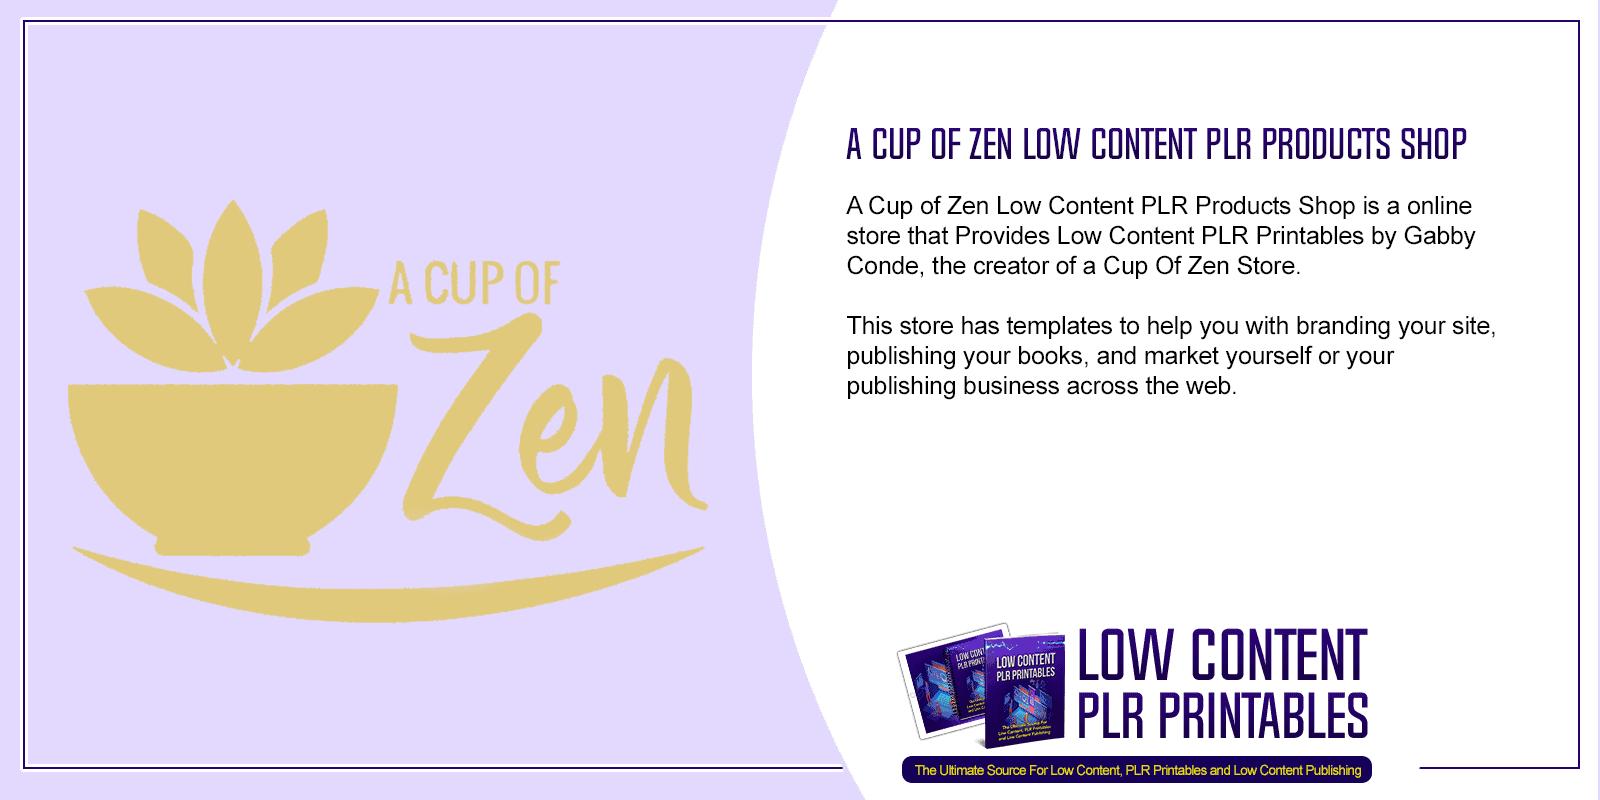 A Cup of Zen Low Content PLR Products Shop